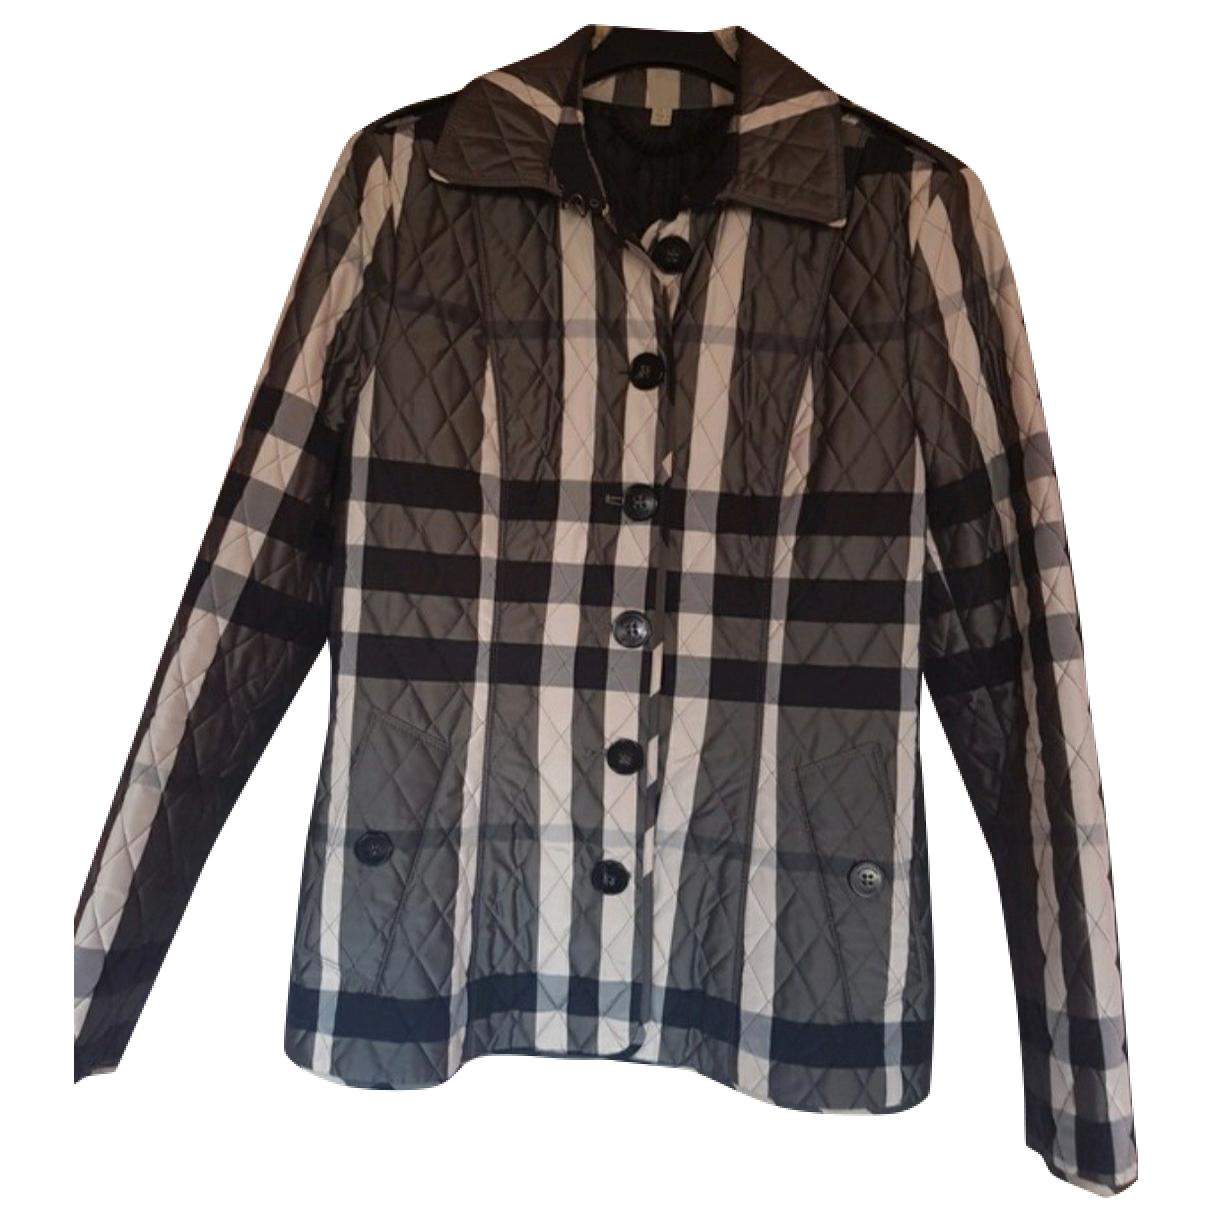 Burberry N Grey Wool jacket for Women 8 UK